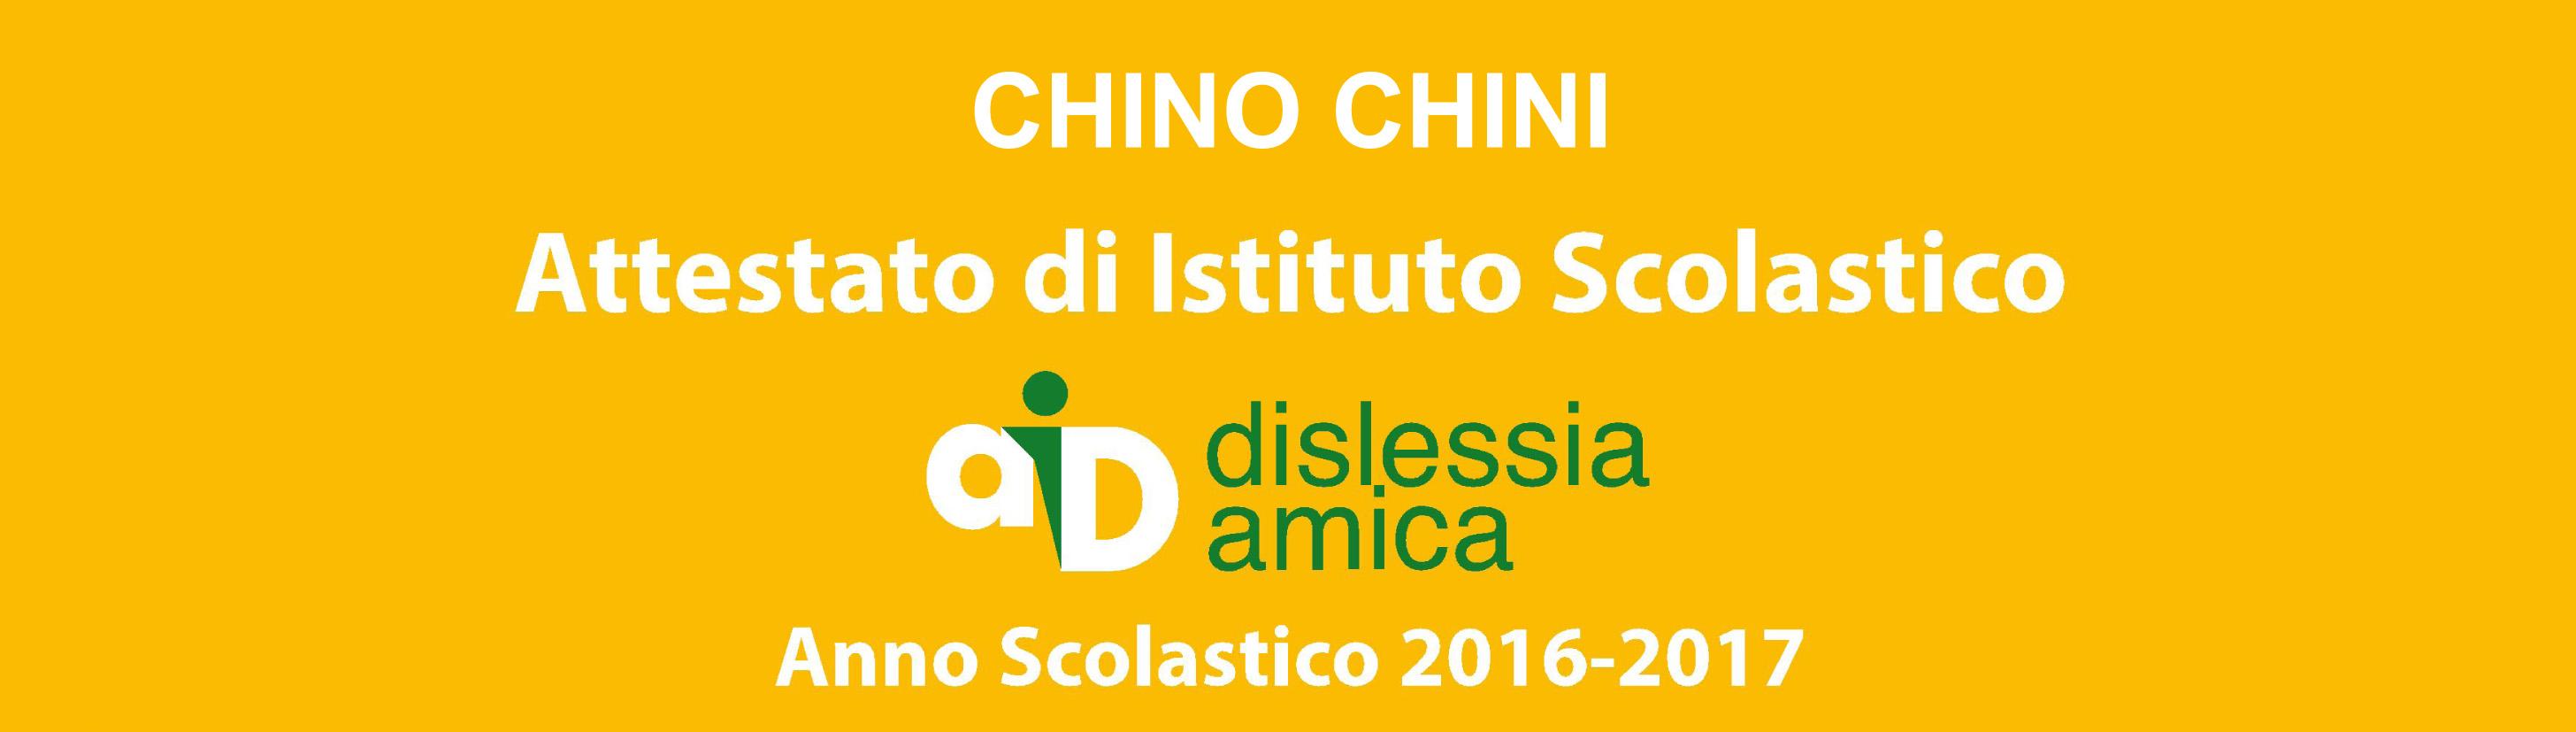 banner dislessia